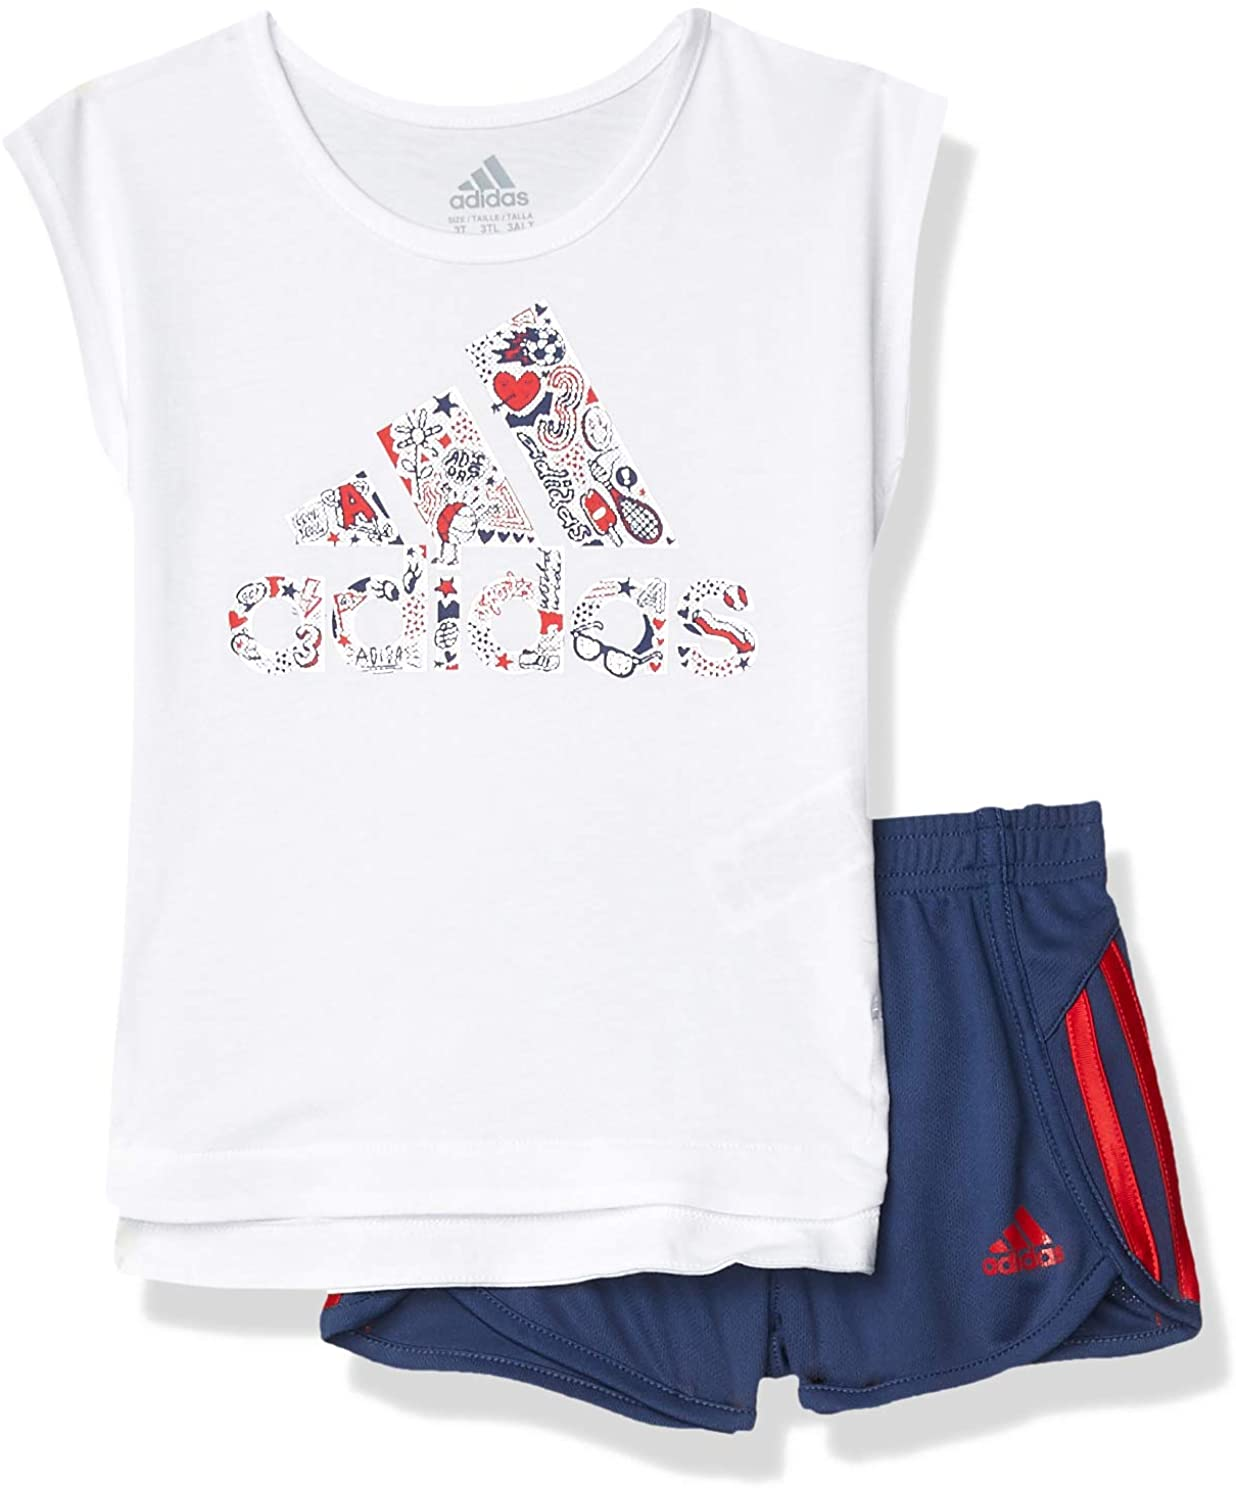 adidas Girls Sleeve Tee & Sport Short Clothing Set